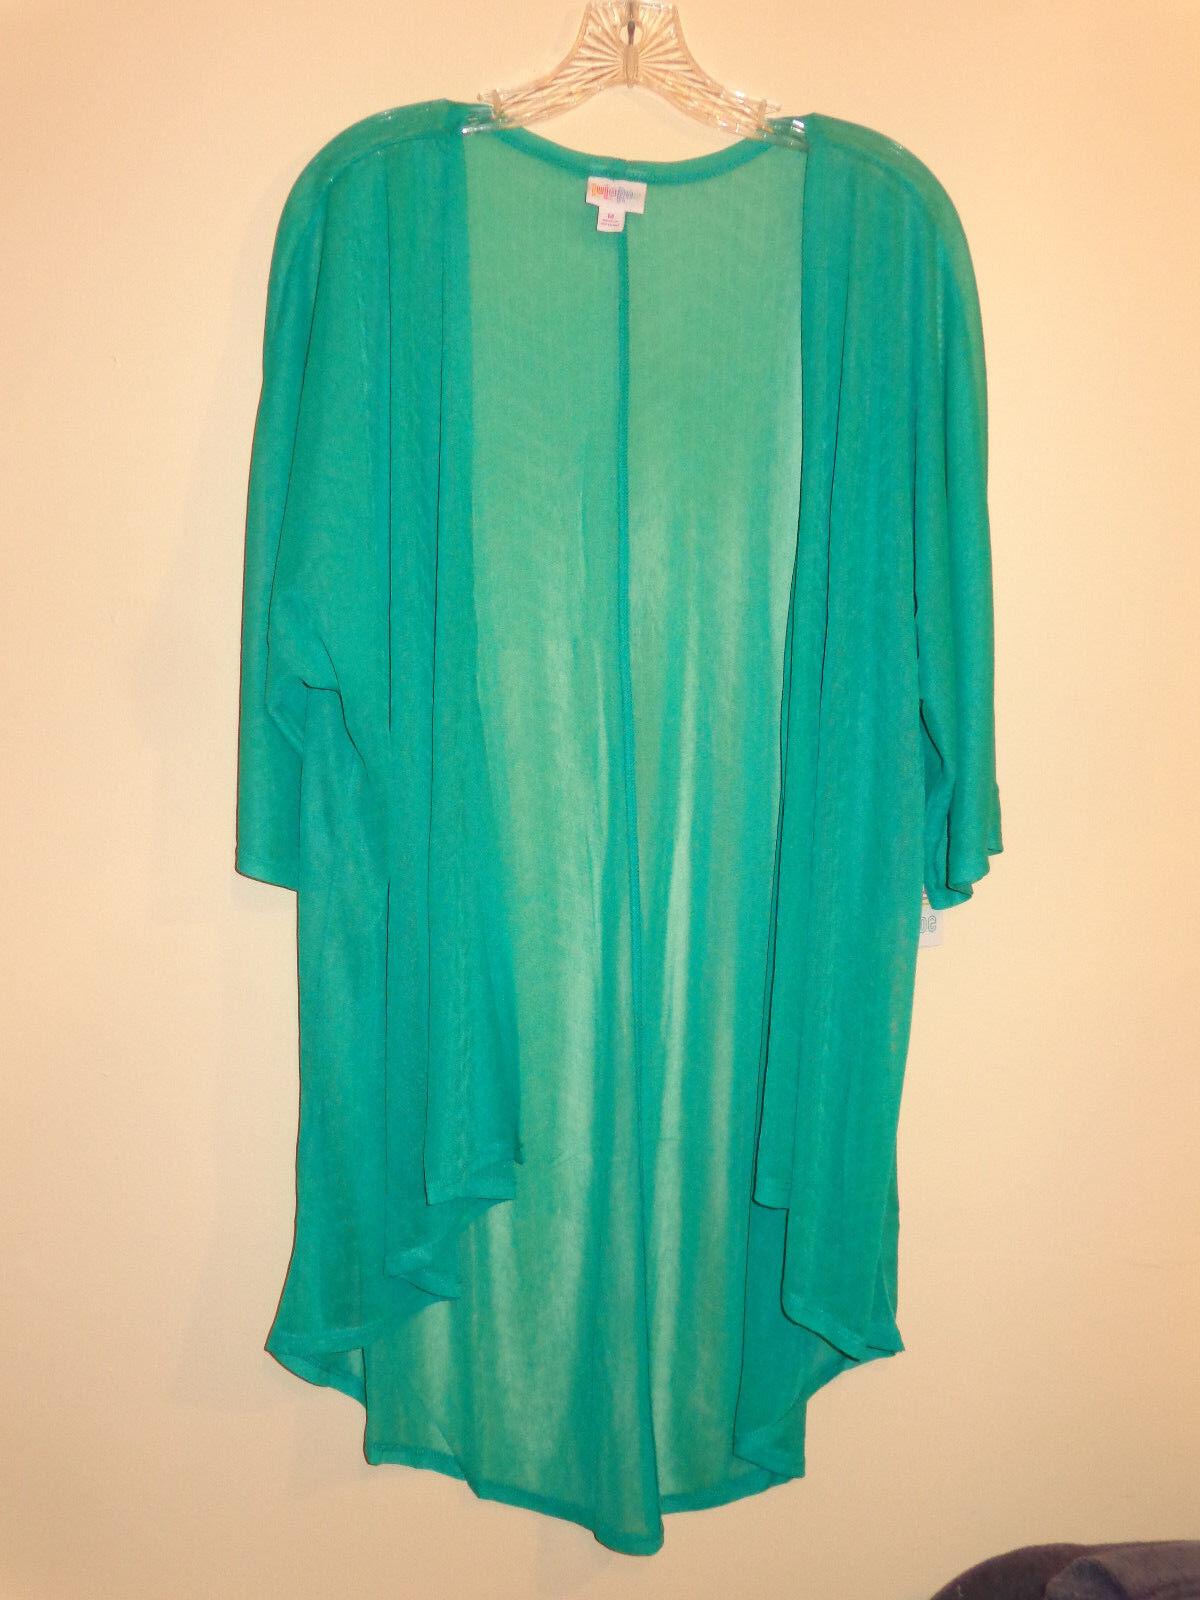 LuLaRoe Medium Lindsay Kimono, Emerald Green Zig Zags NWT